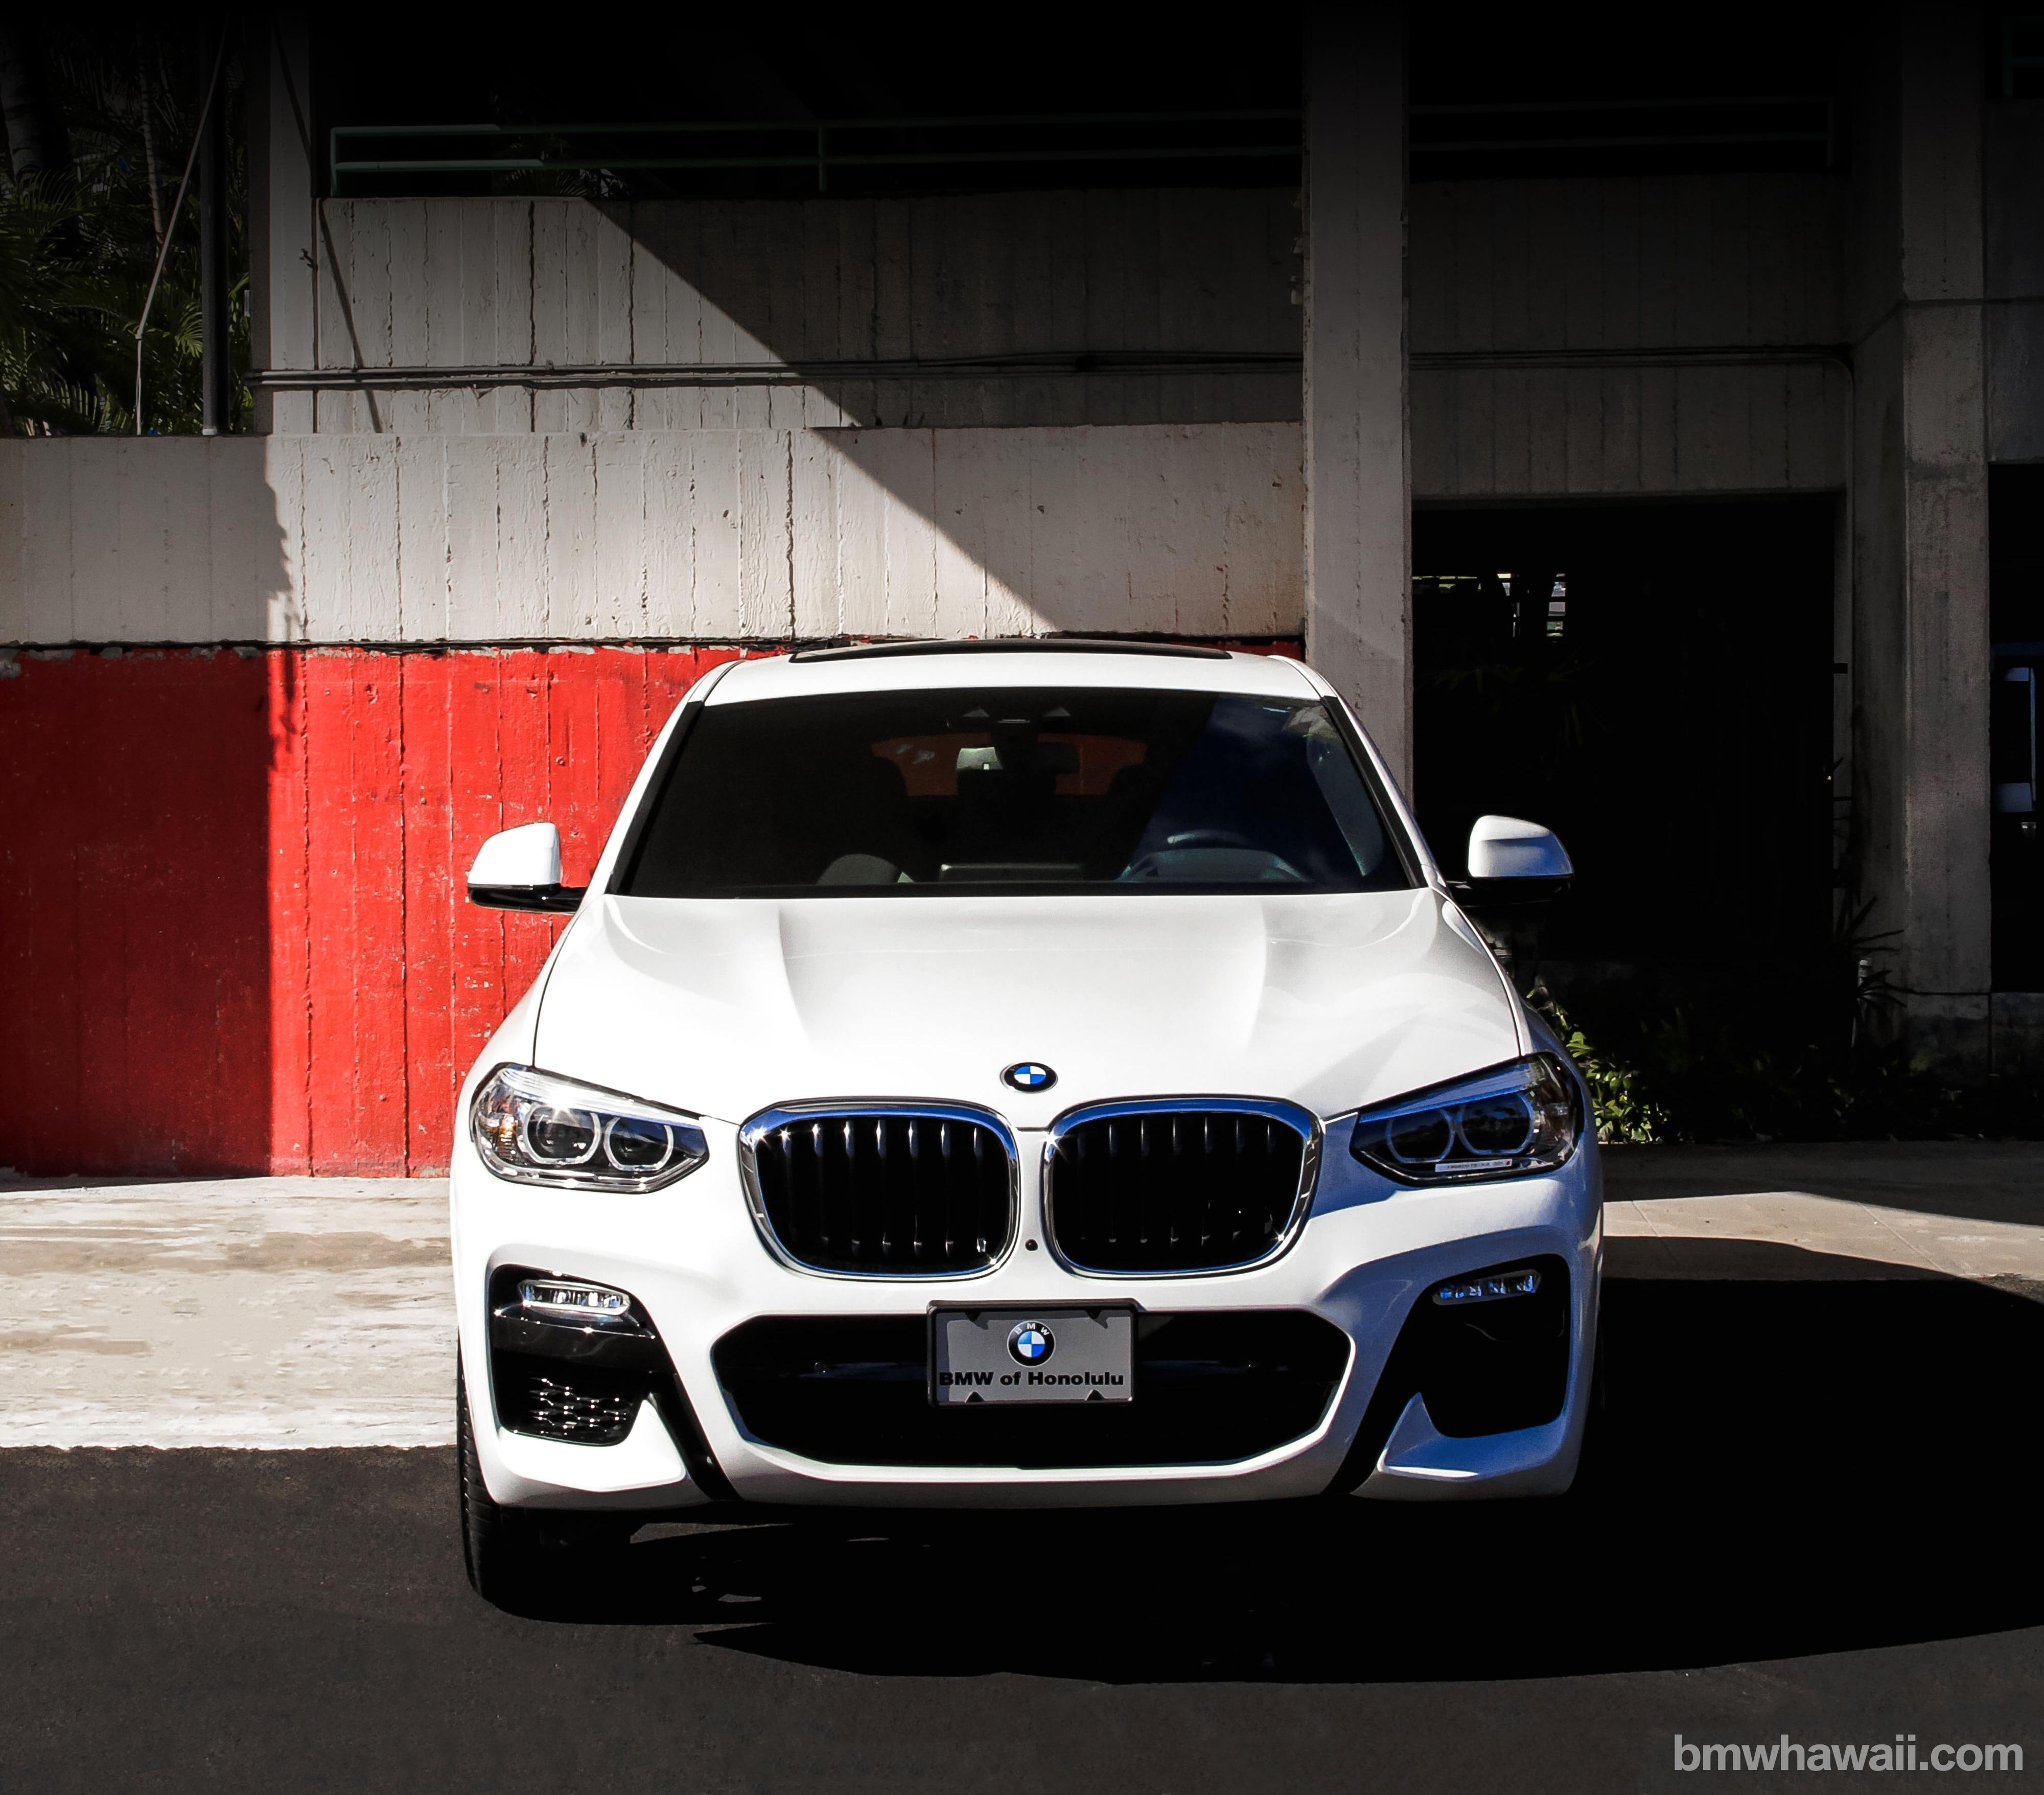 BMW Of Honolulu: BMW Dealership Honolulu HI